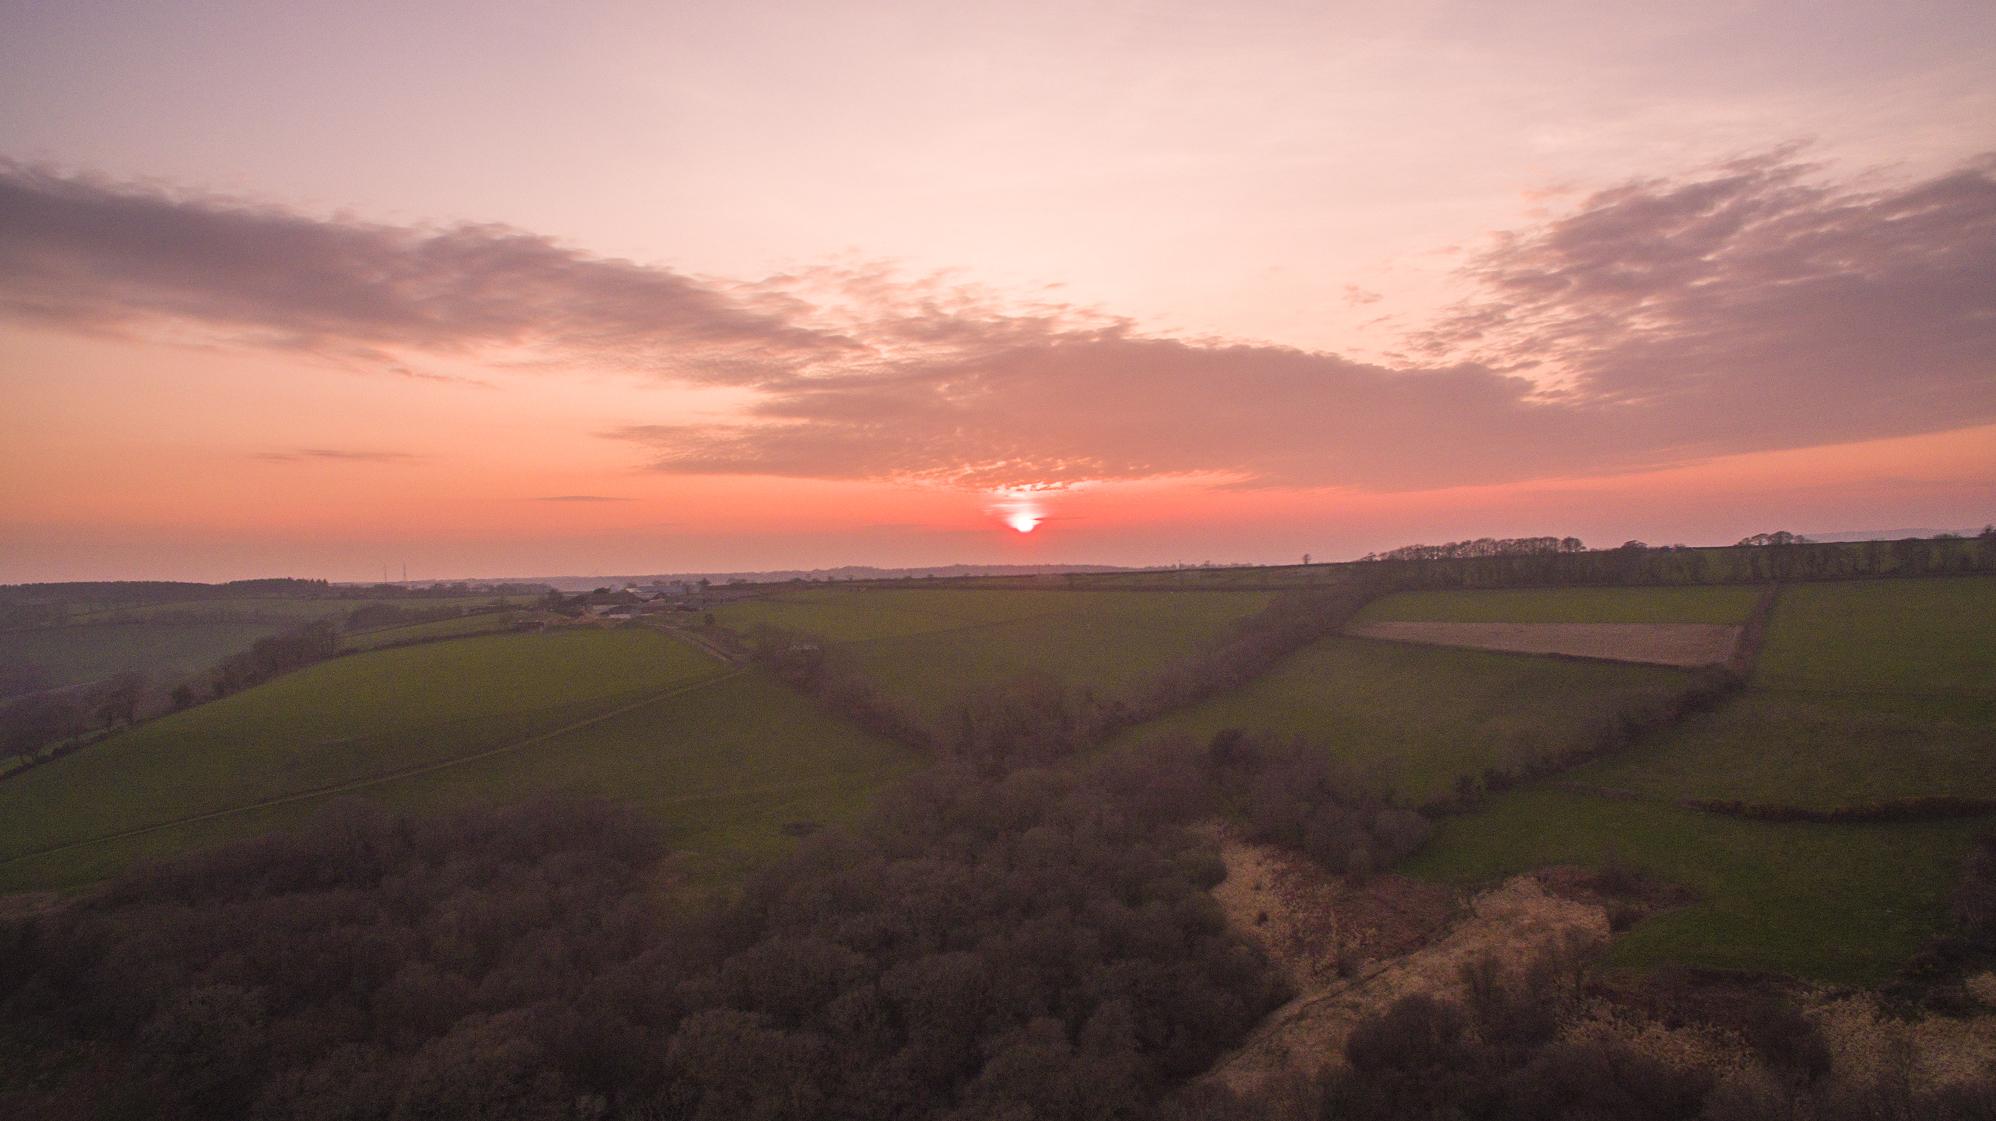 Sunset-in-East-Devon-UAV-Hire.com